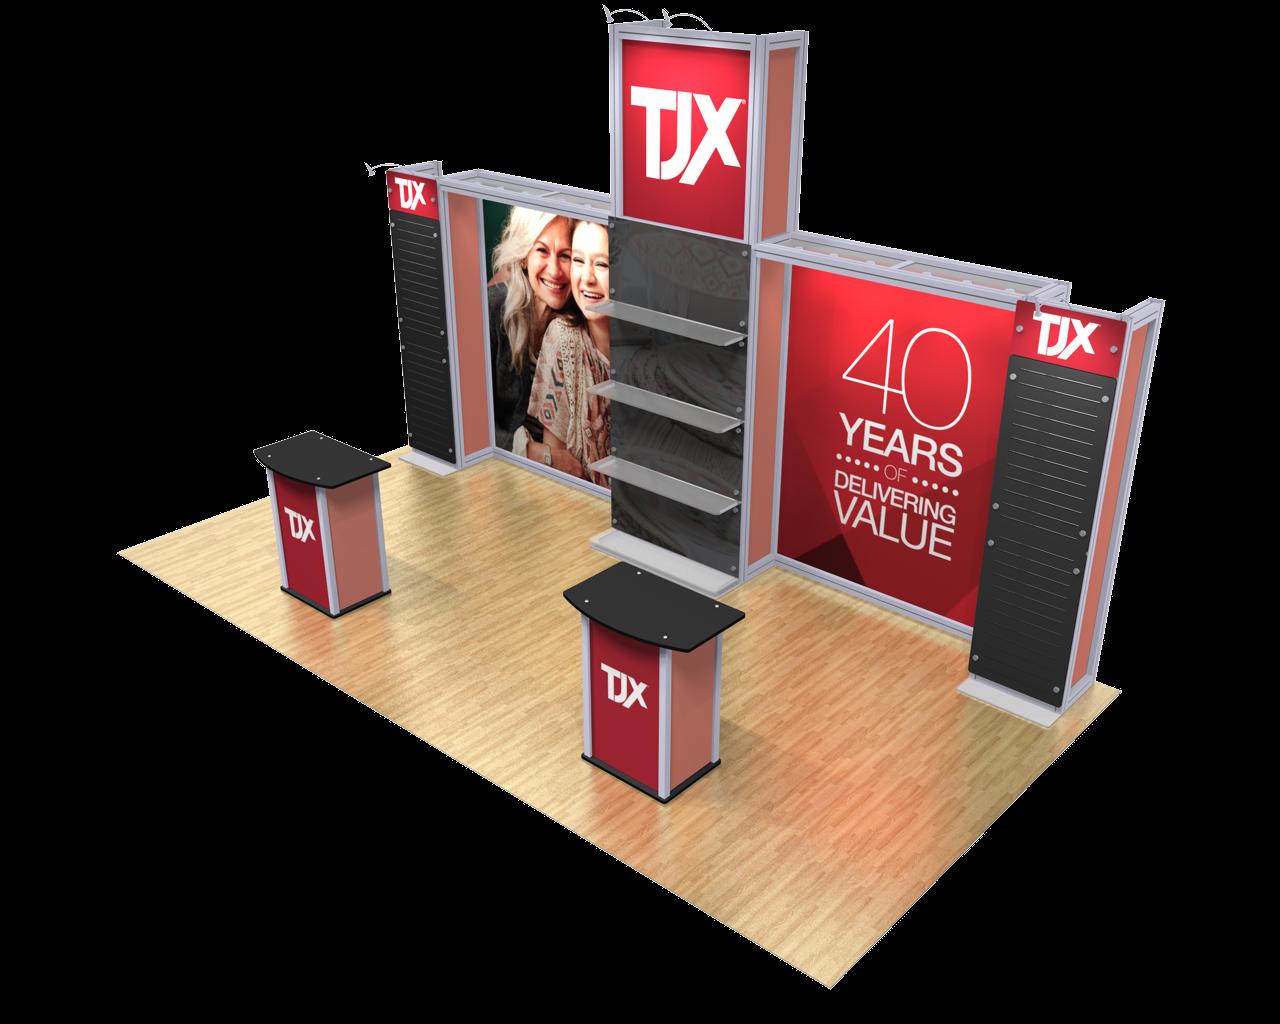 XVline Modular Kit 20.07 10x20 display Side View